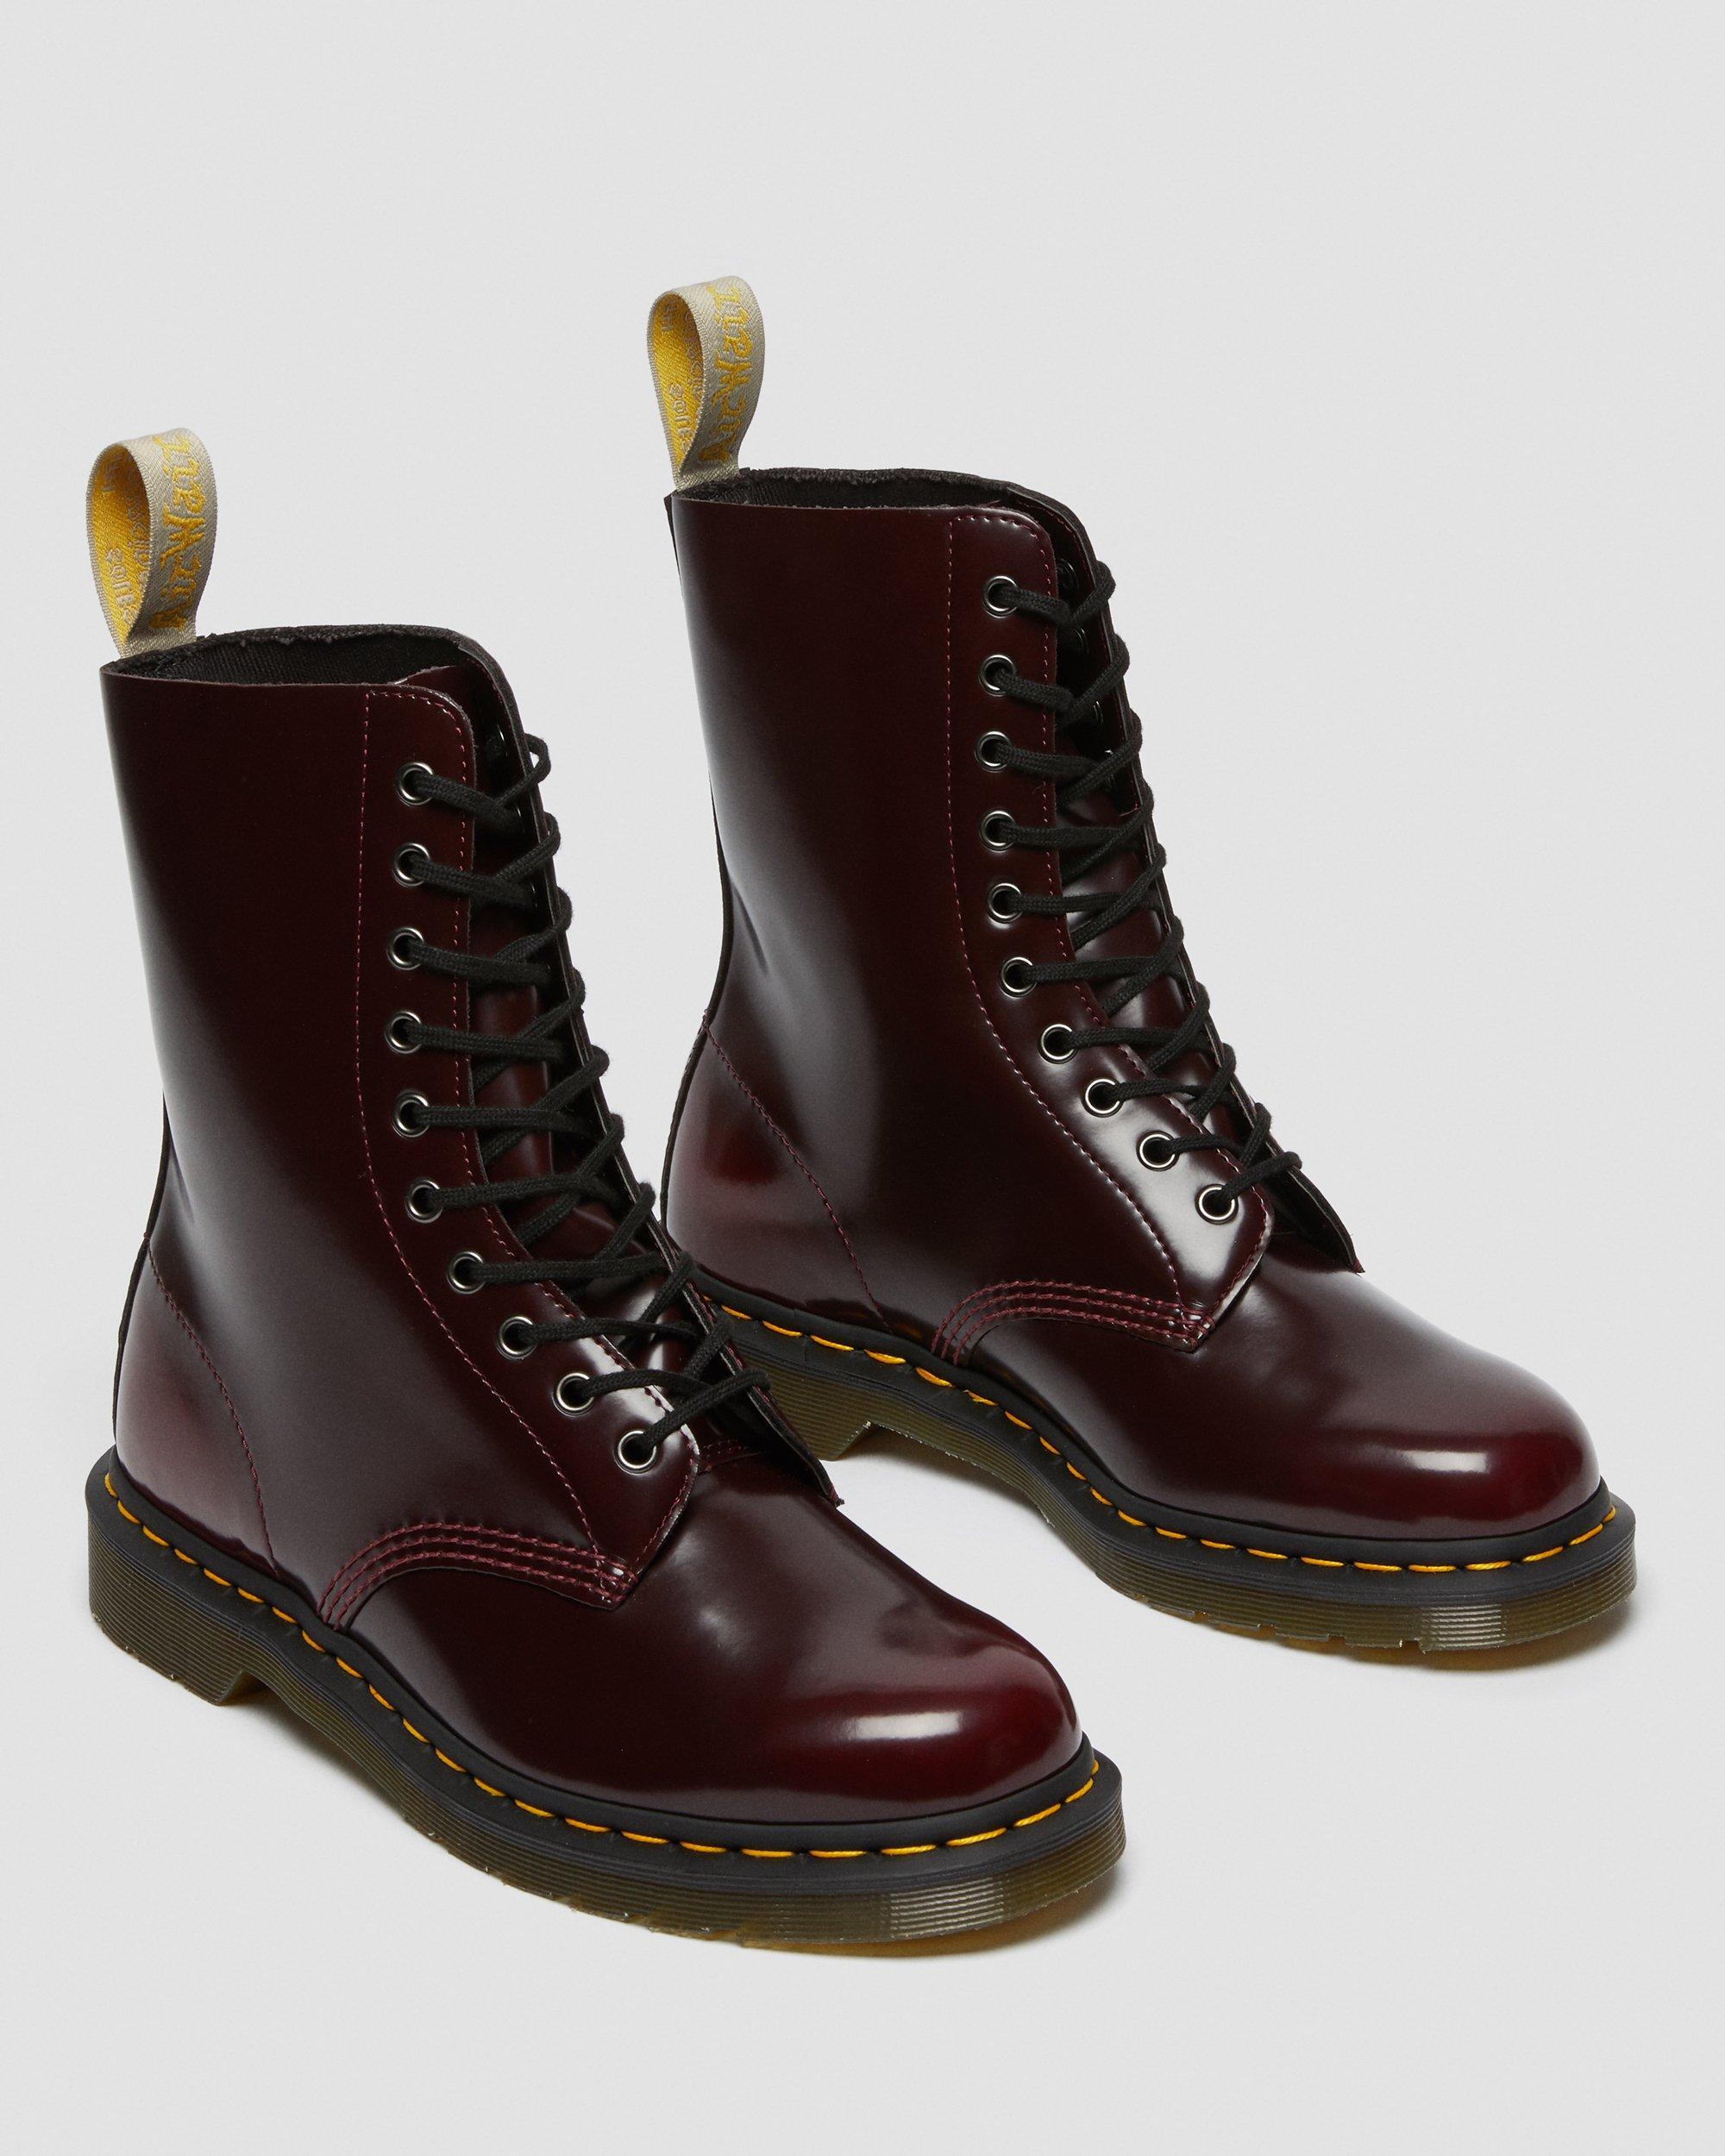 Vegan Boot   DR. MARTENS 1490 10 Eye Boot Cherry Red Oxford